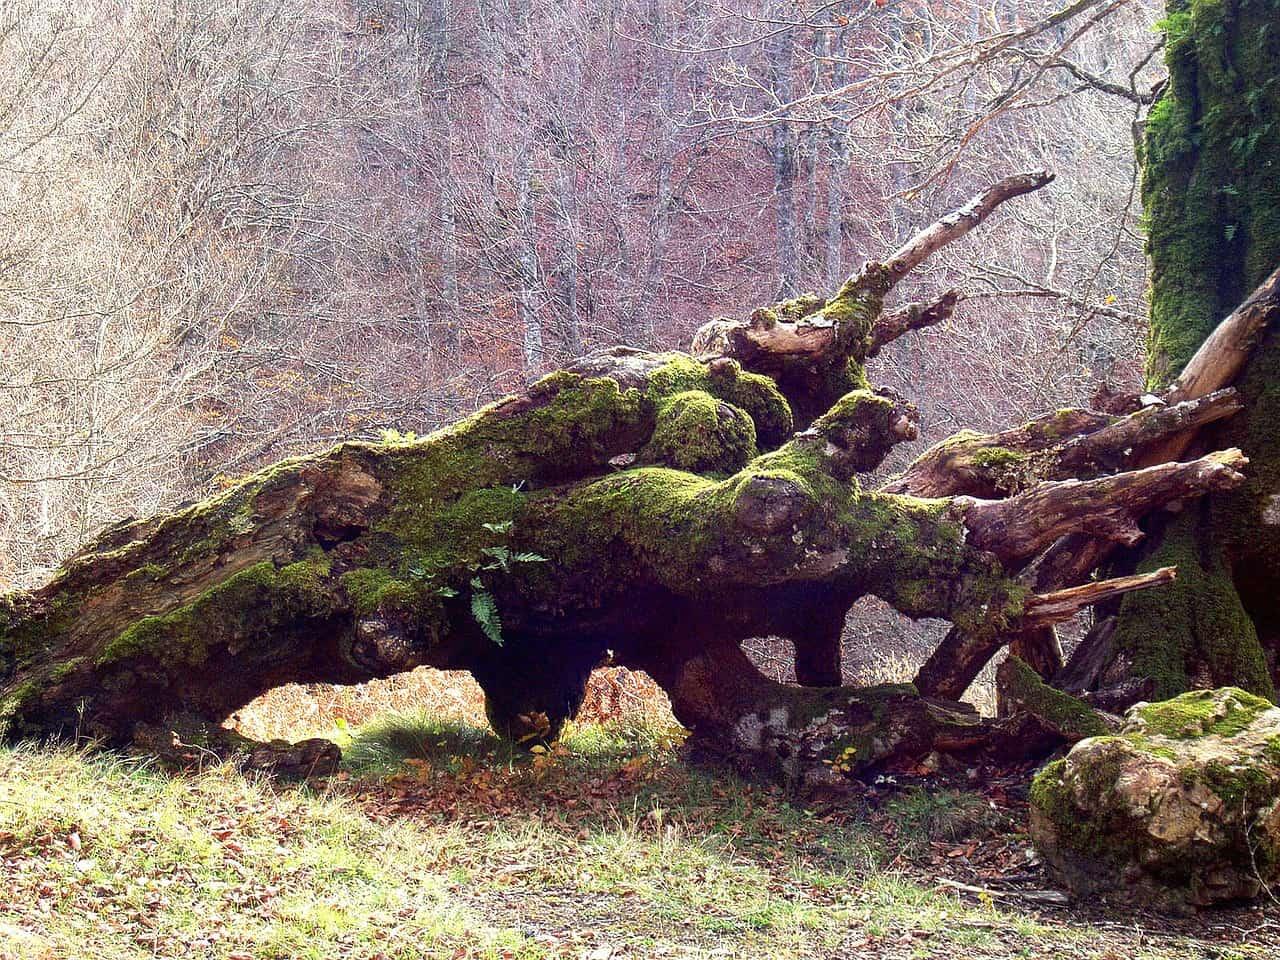 Hurricane Tree Removal in Longwood